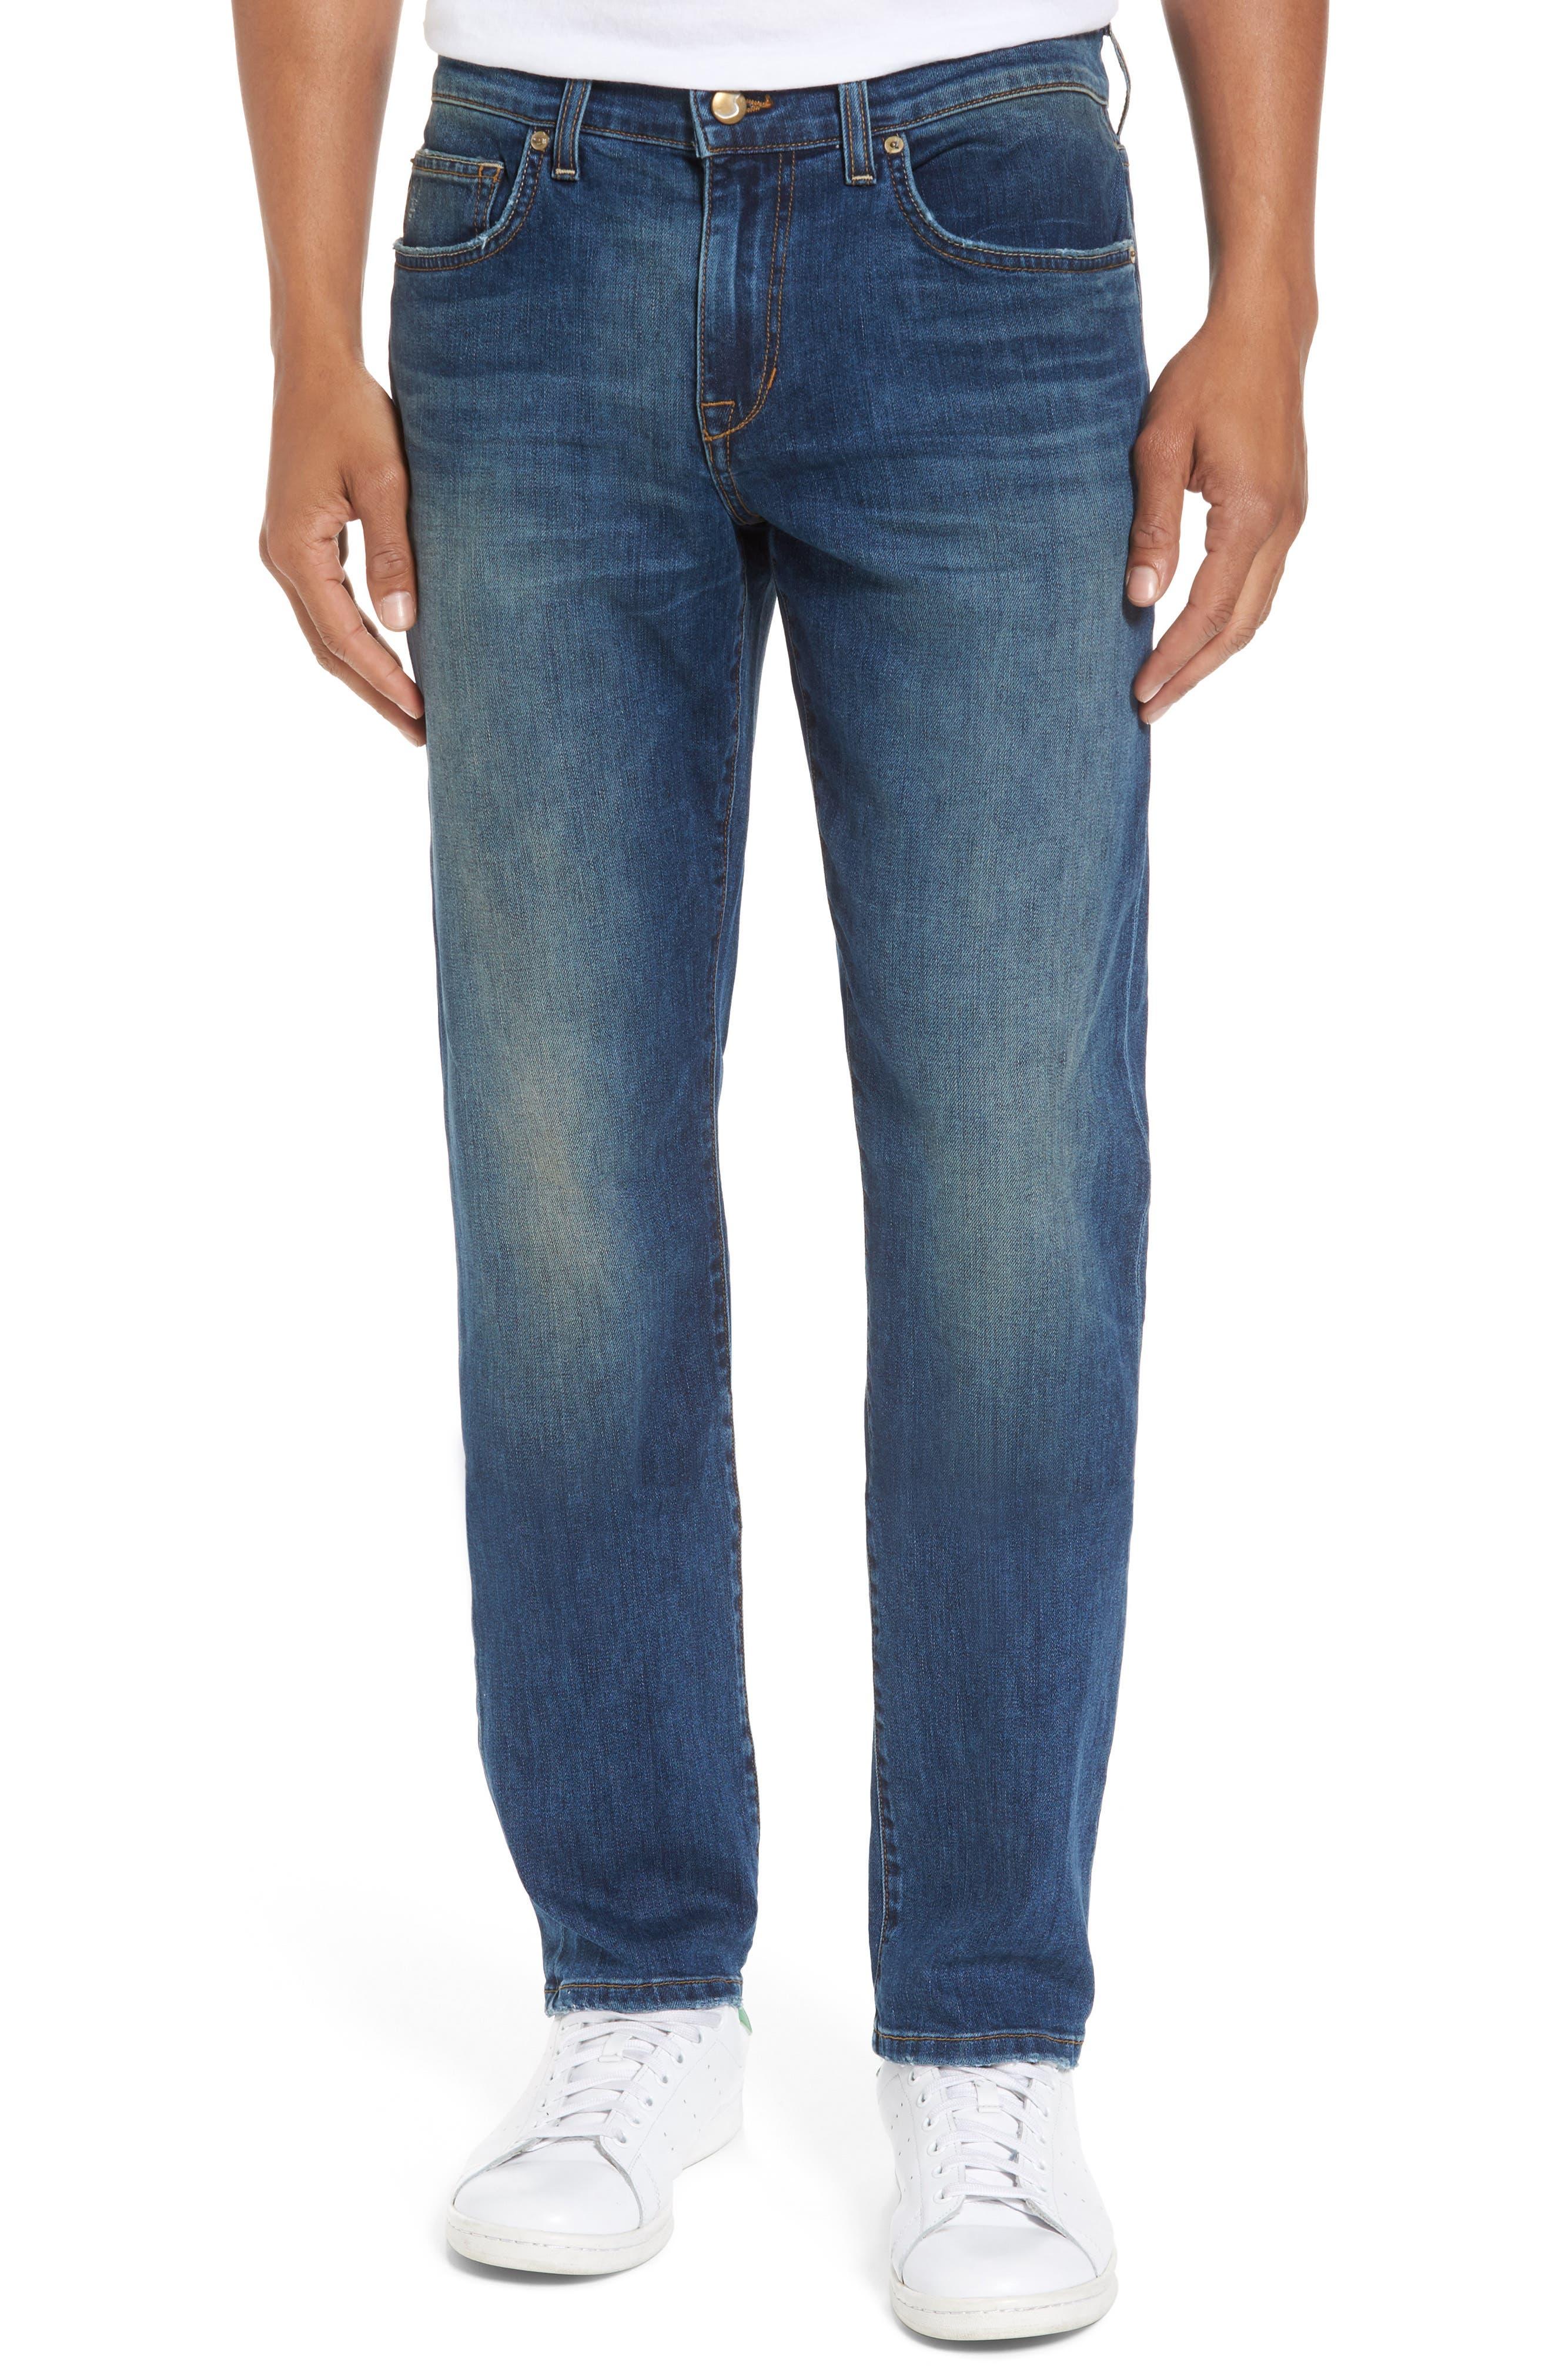 Main Image - Joe's Slim Fit Jeans (Dalton)